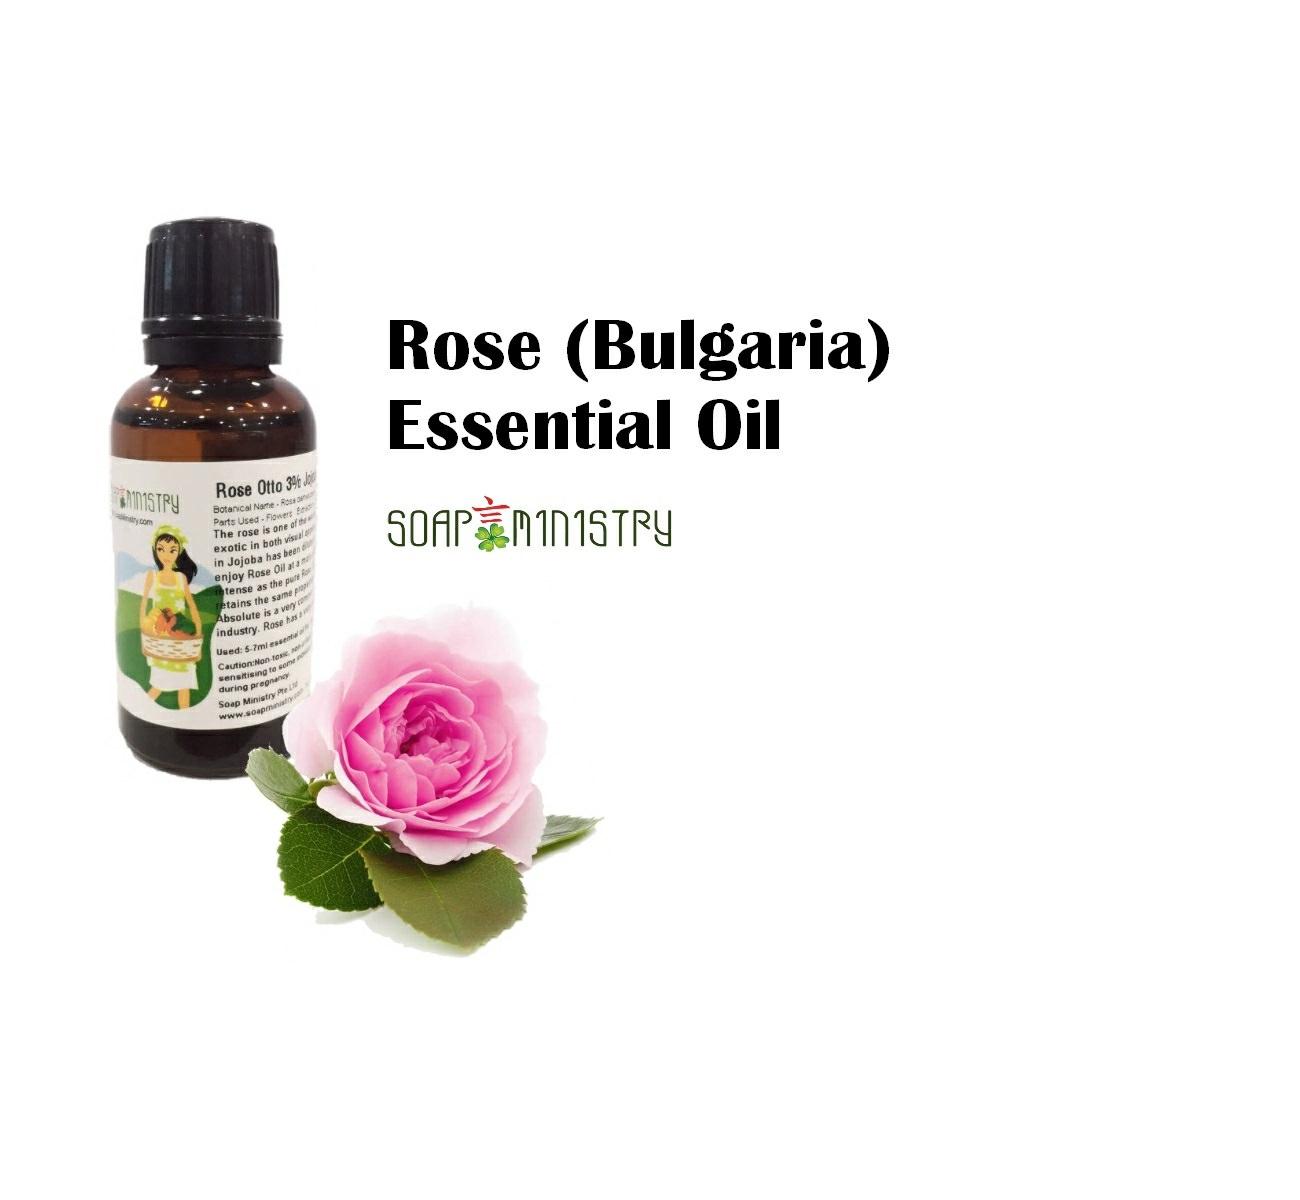 Rose Otto 3 Jojoba Essential Oil 50ml